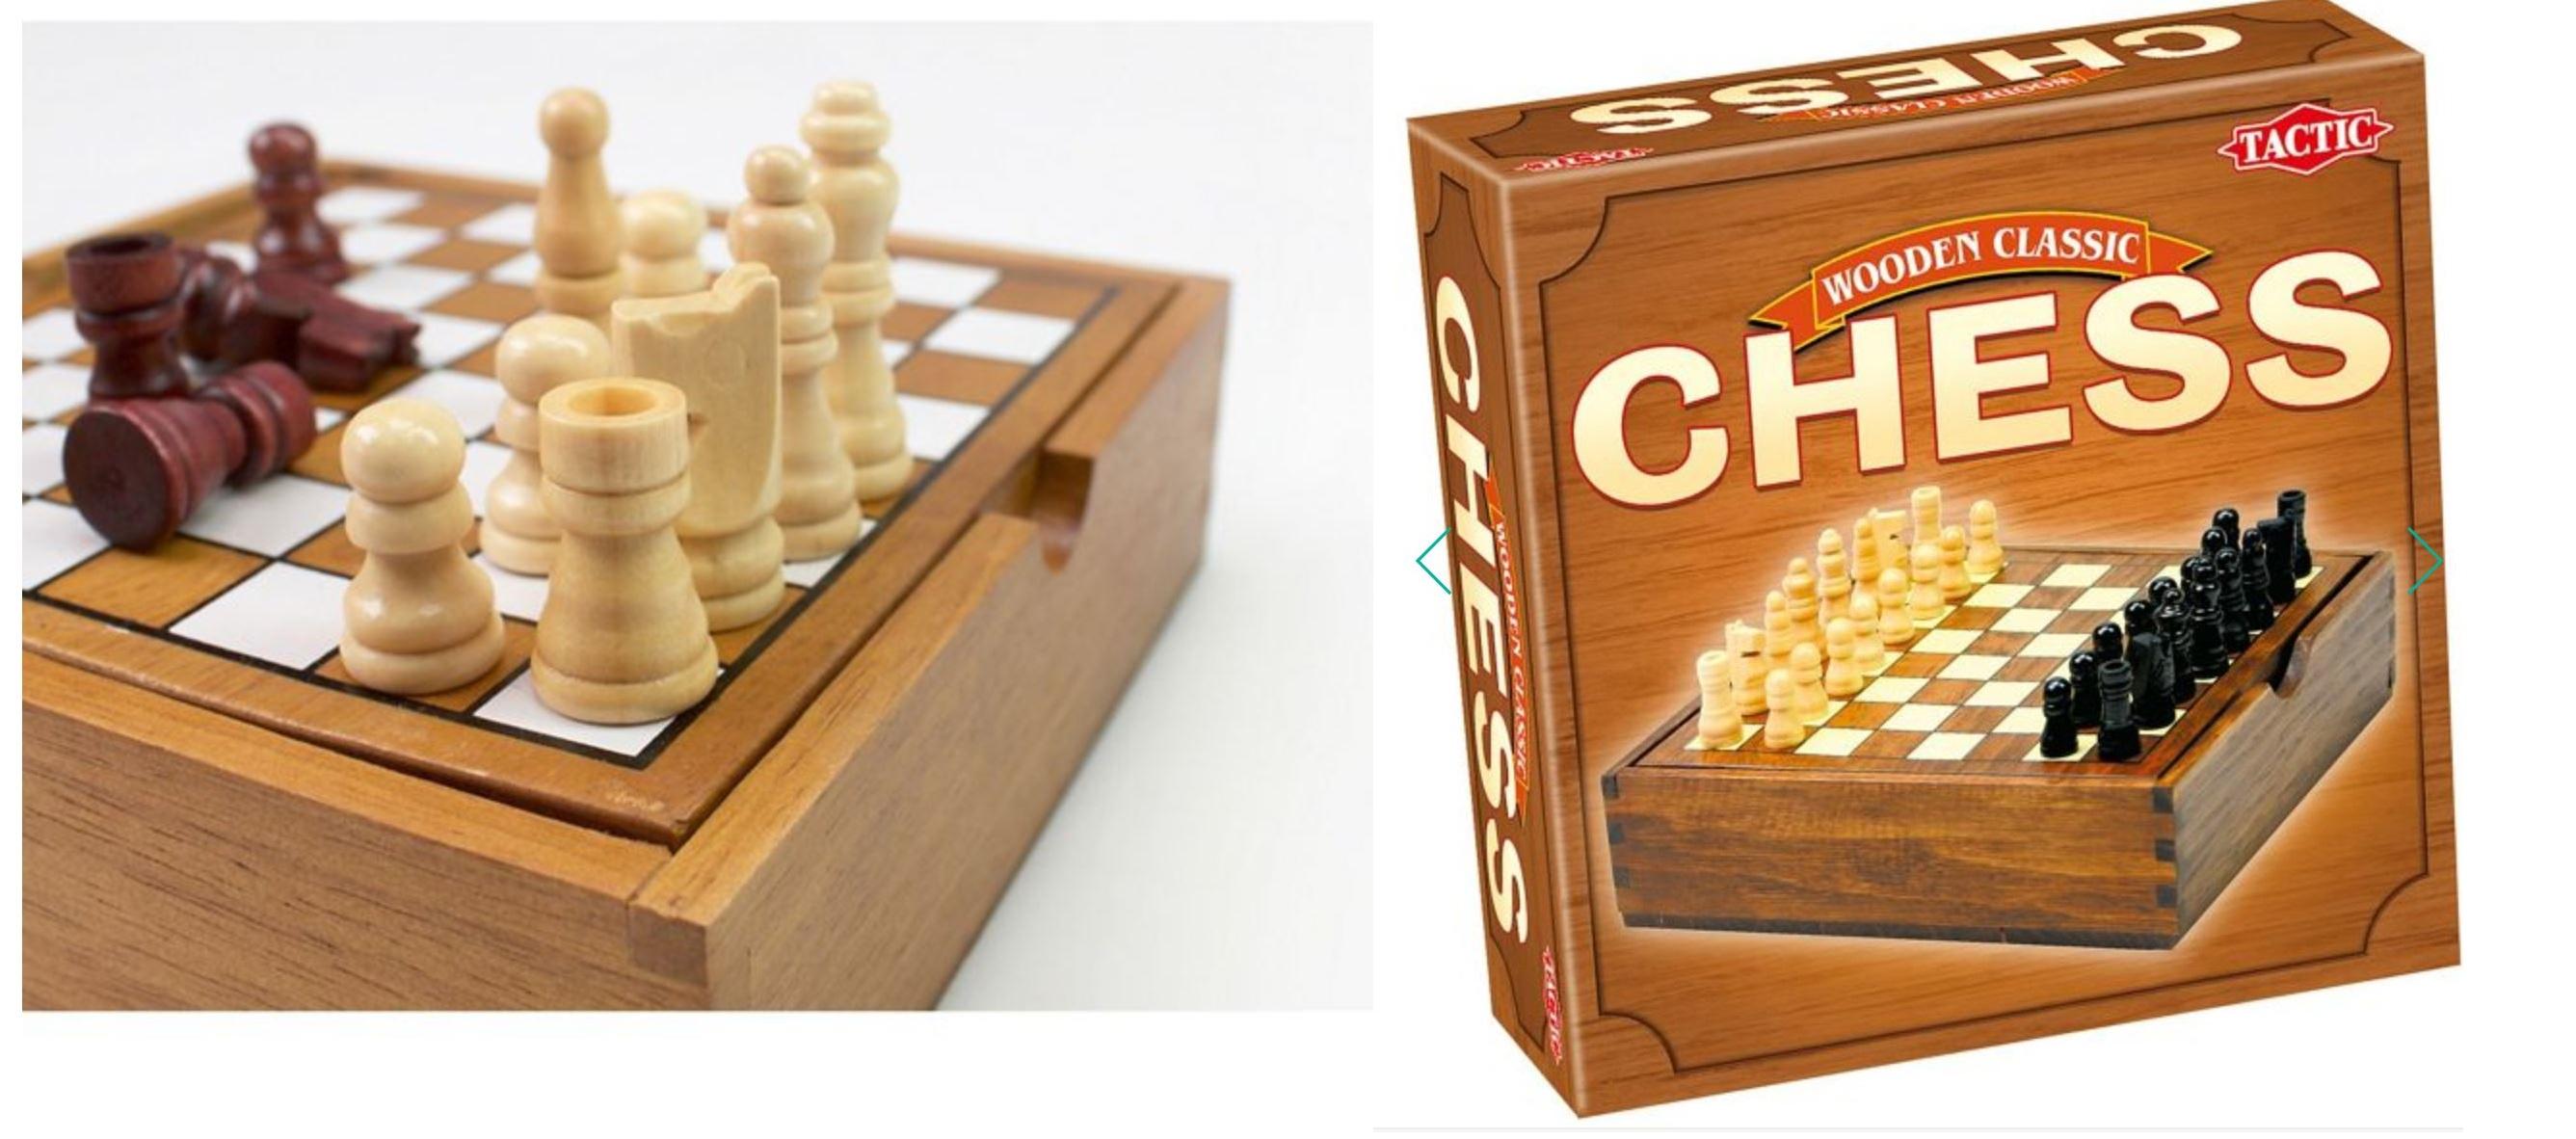 Tactic - Wooden classic chess set for £8 free C&C w/c @ Debenhams